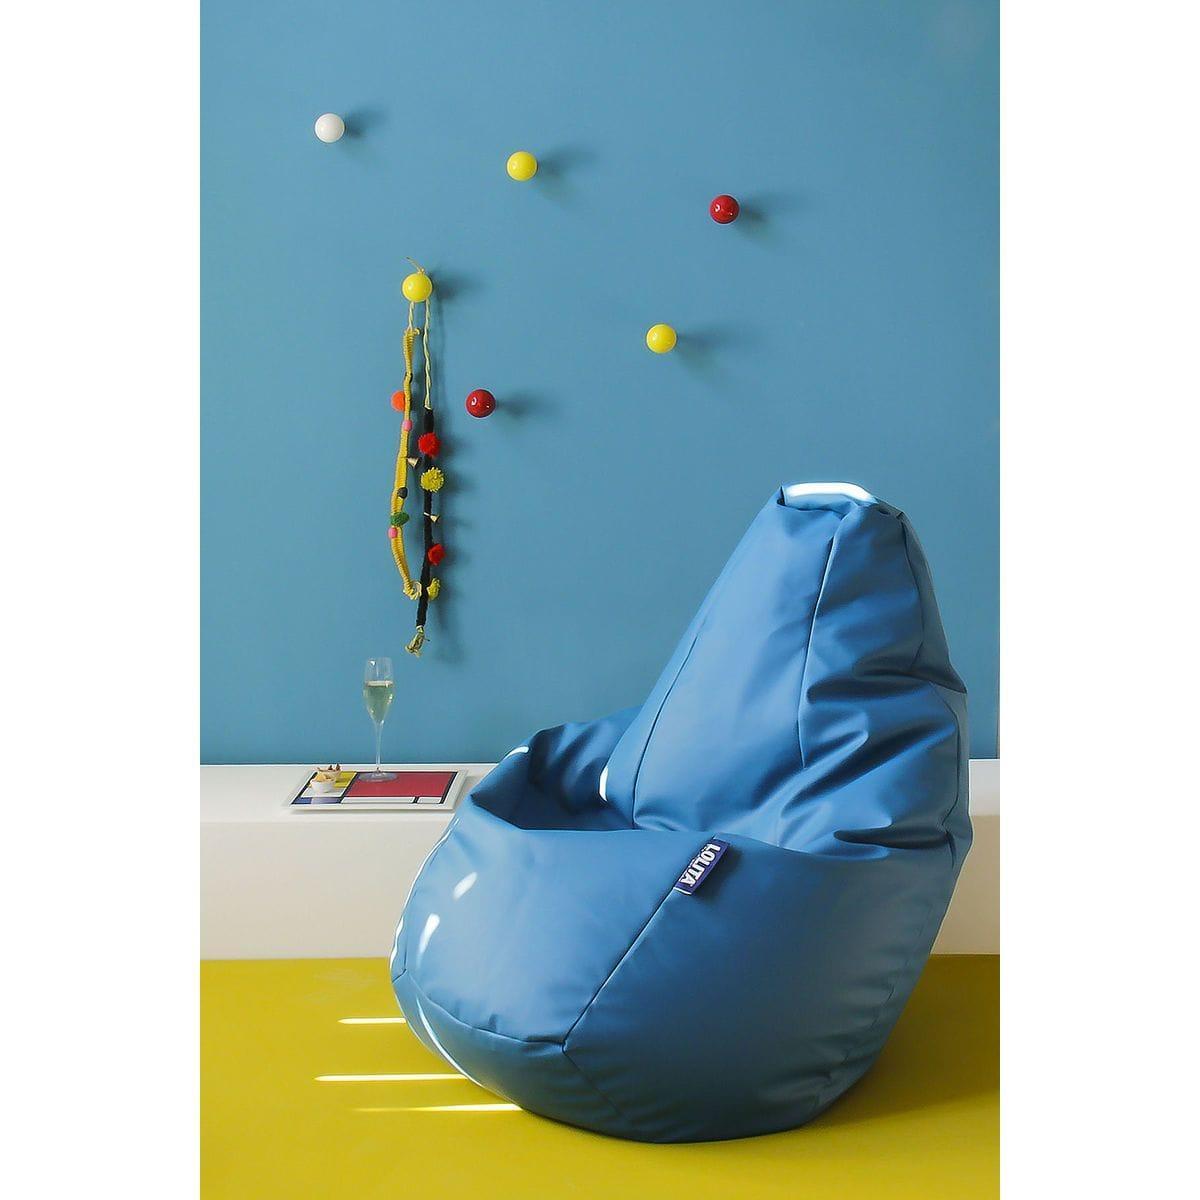 ganci appendiabiti a forma di pallina di biliardo montati su parete azzurra